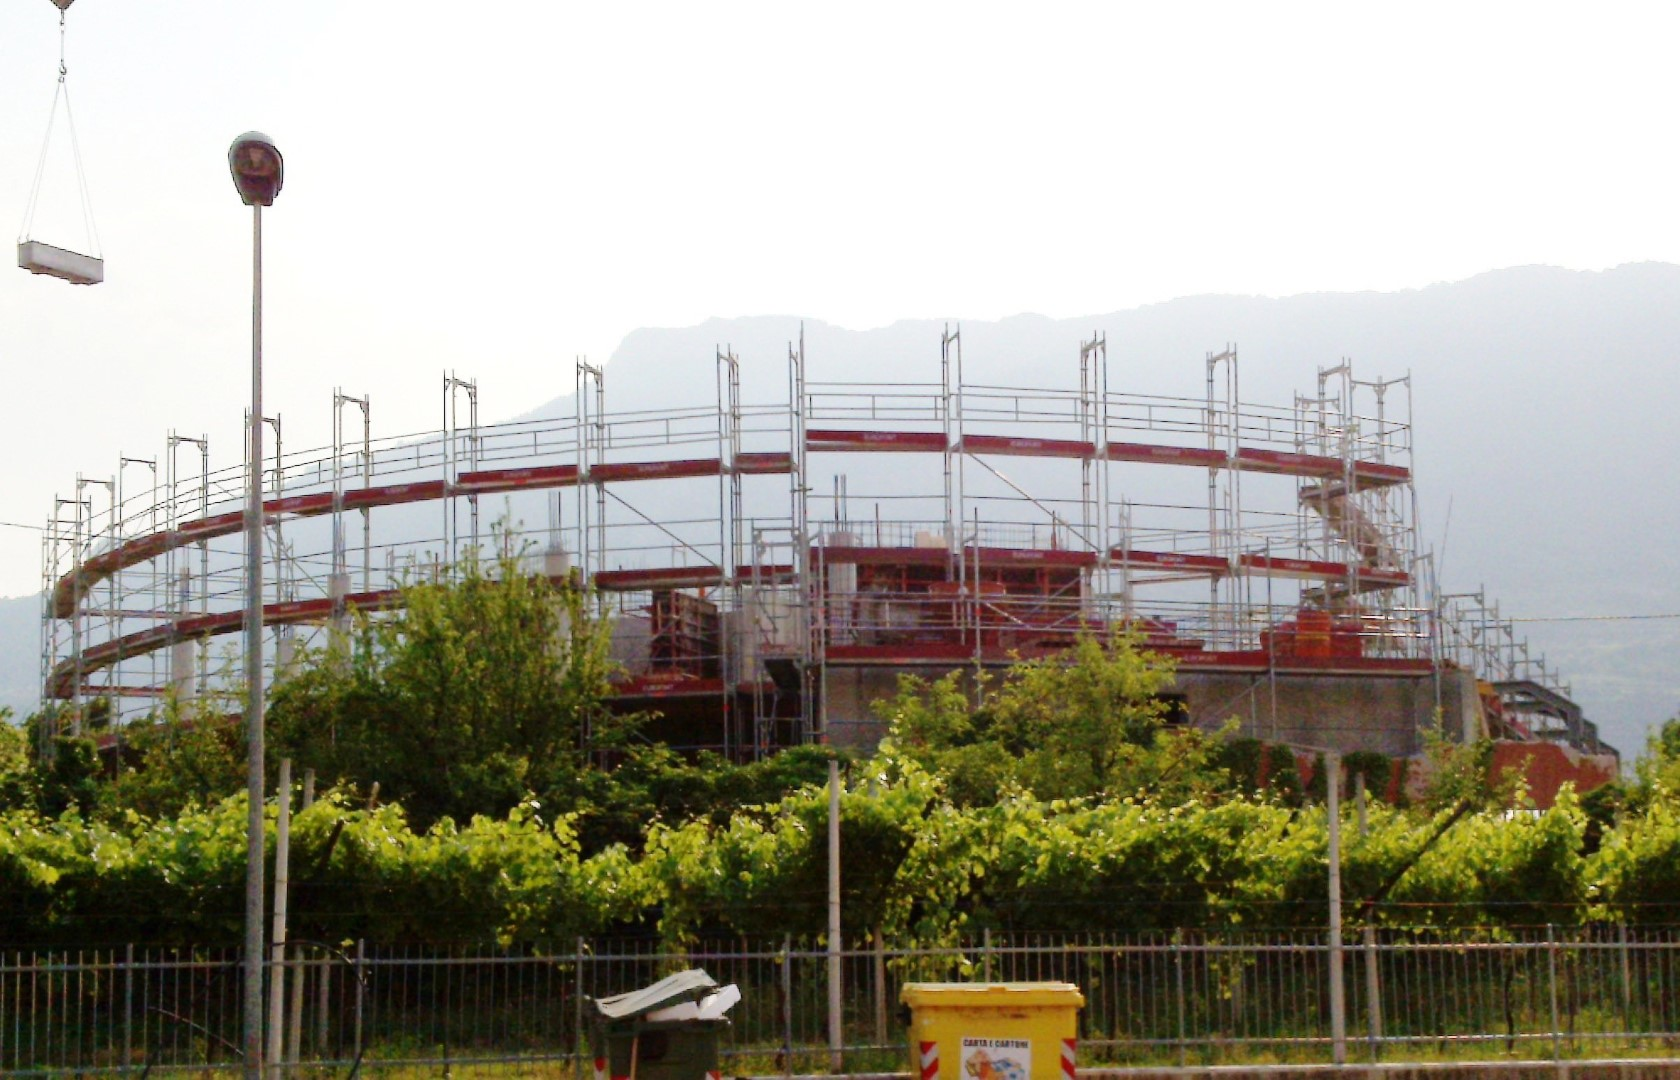 13 Ponteggio per costruzione impianti digestione Rovereto TN - Gerüste für die Industrie